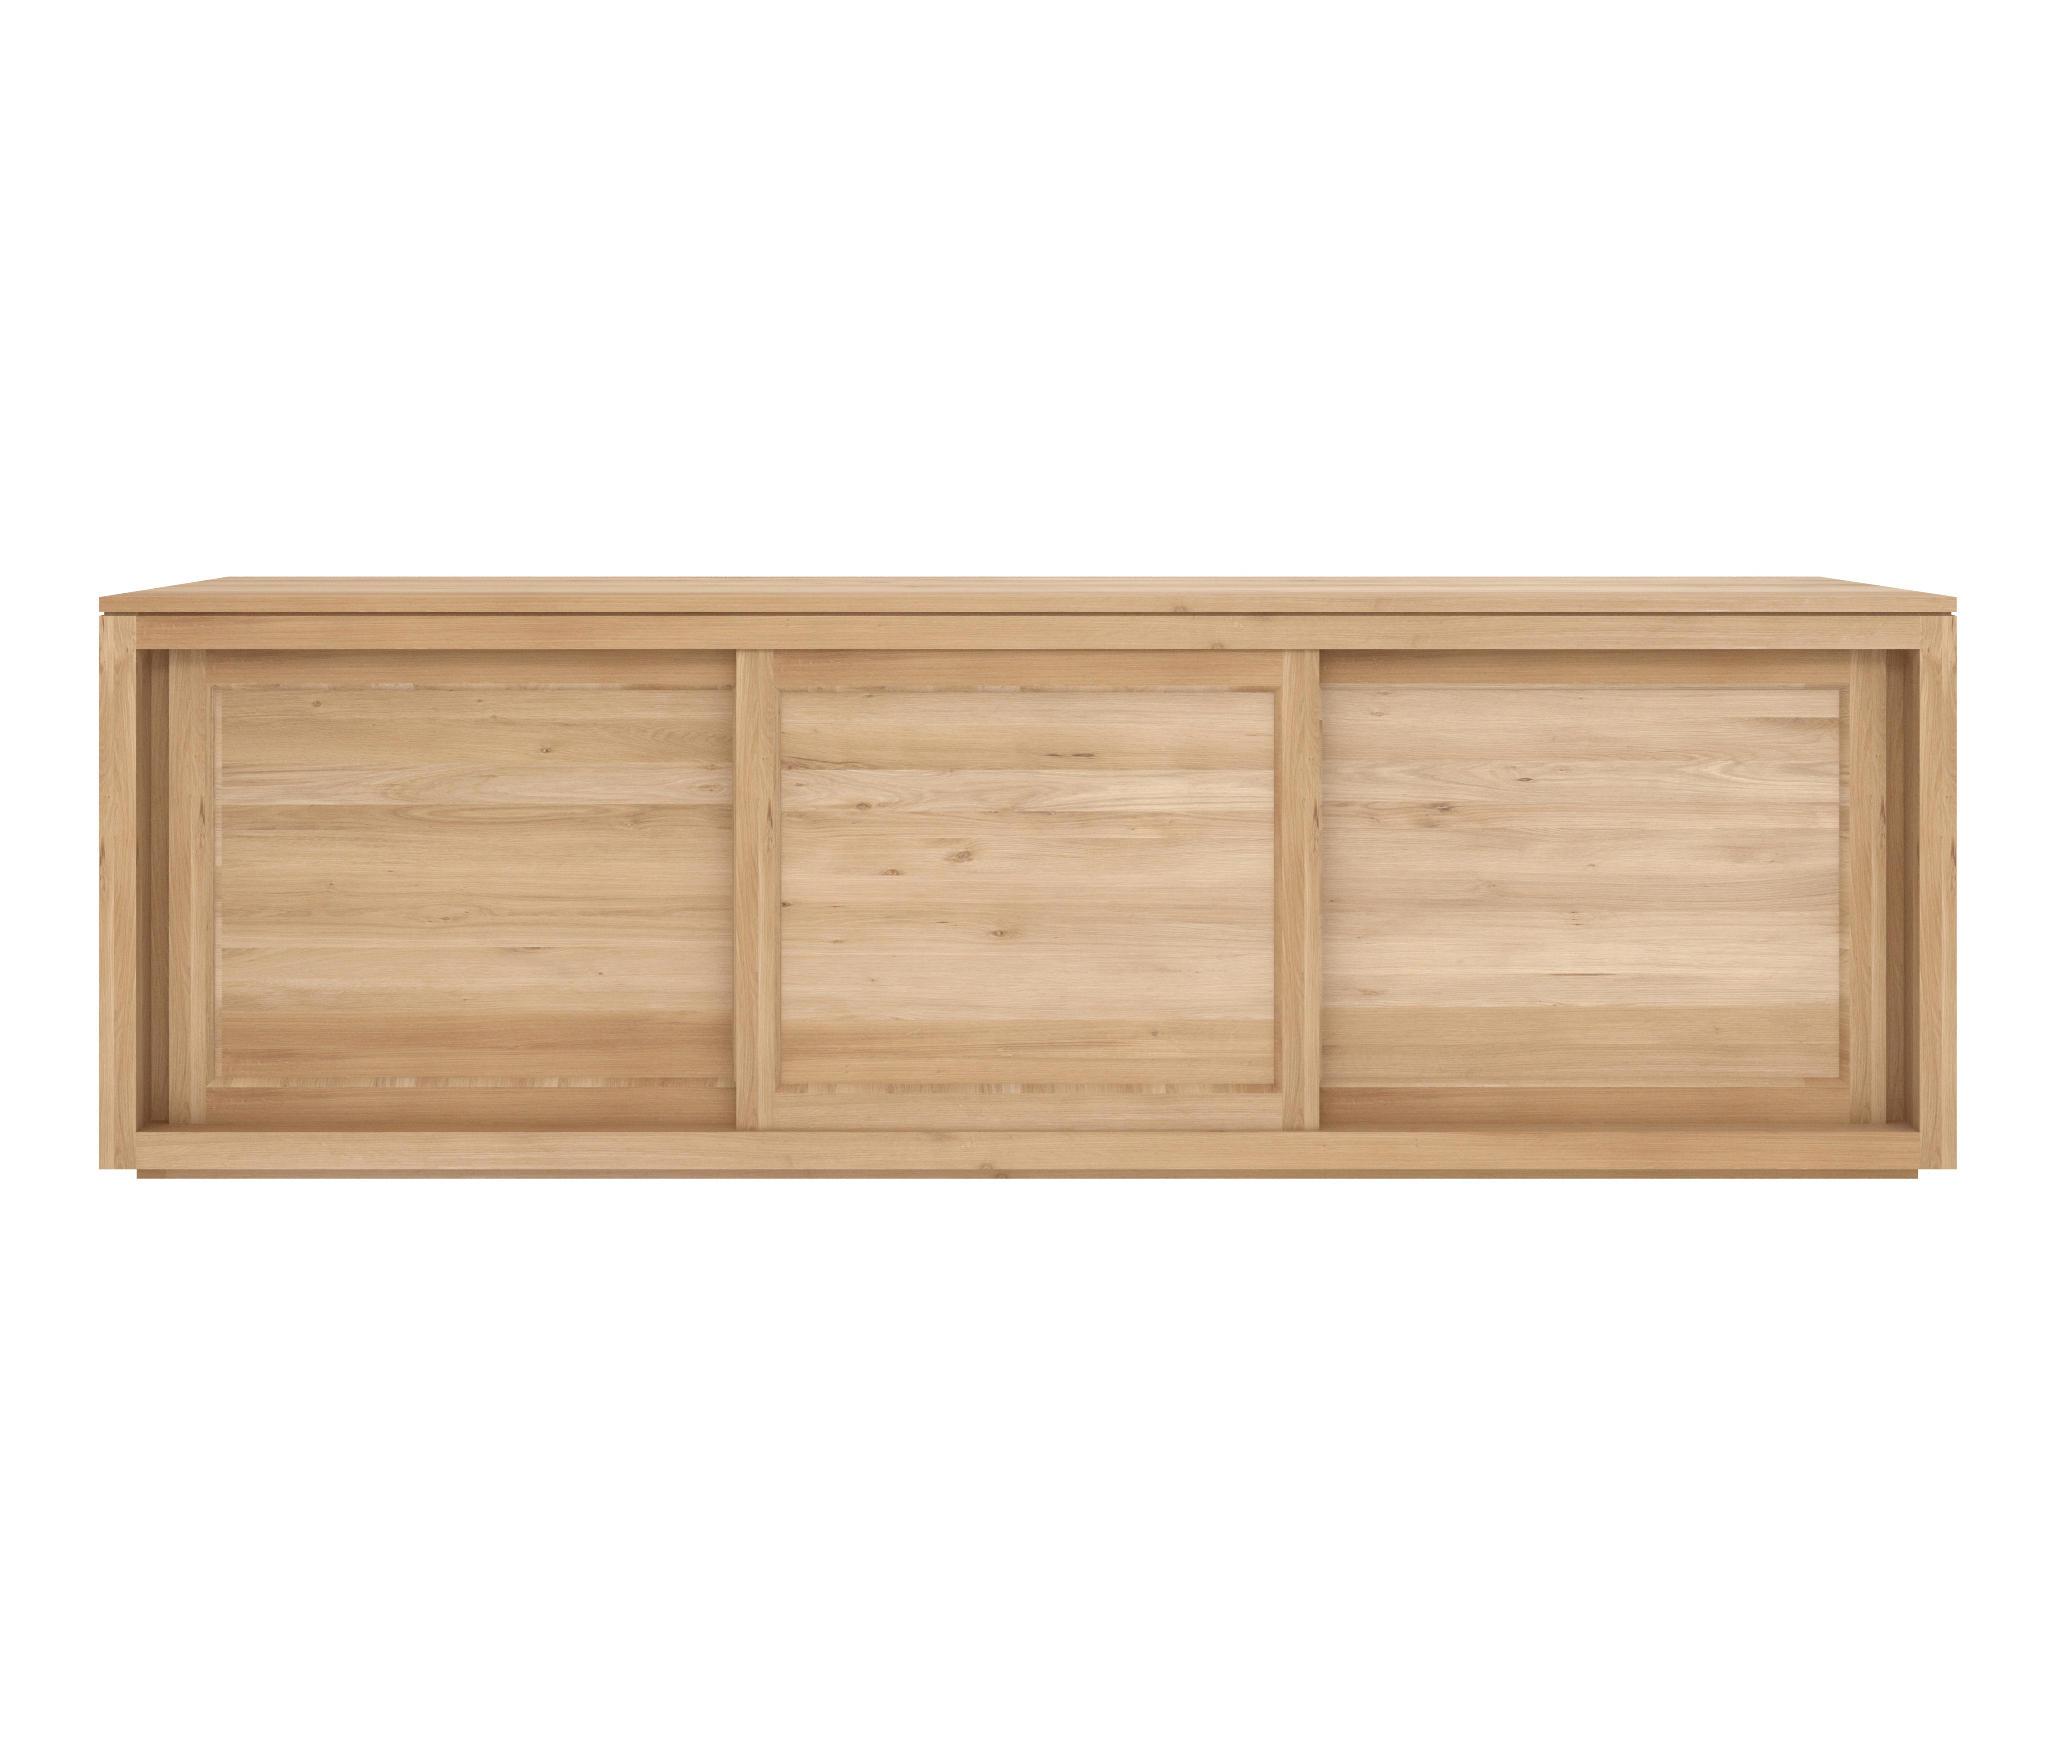 Ethnicraft Oak Pure sideboard 250 cm - 3 sliding doors